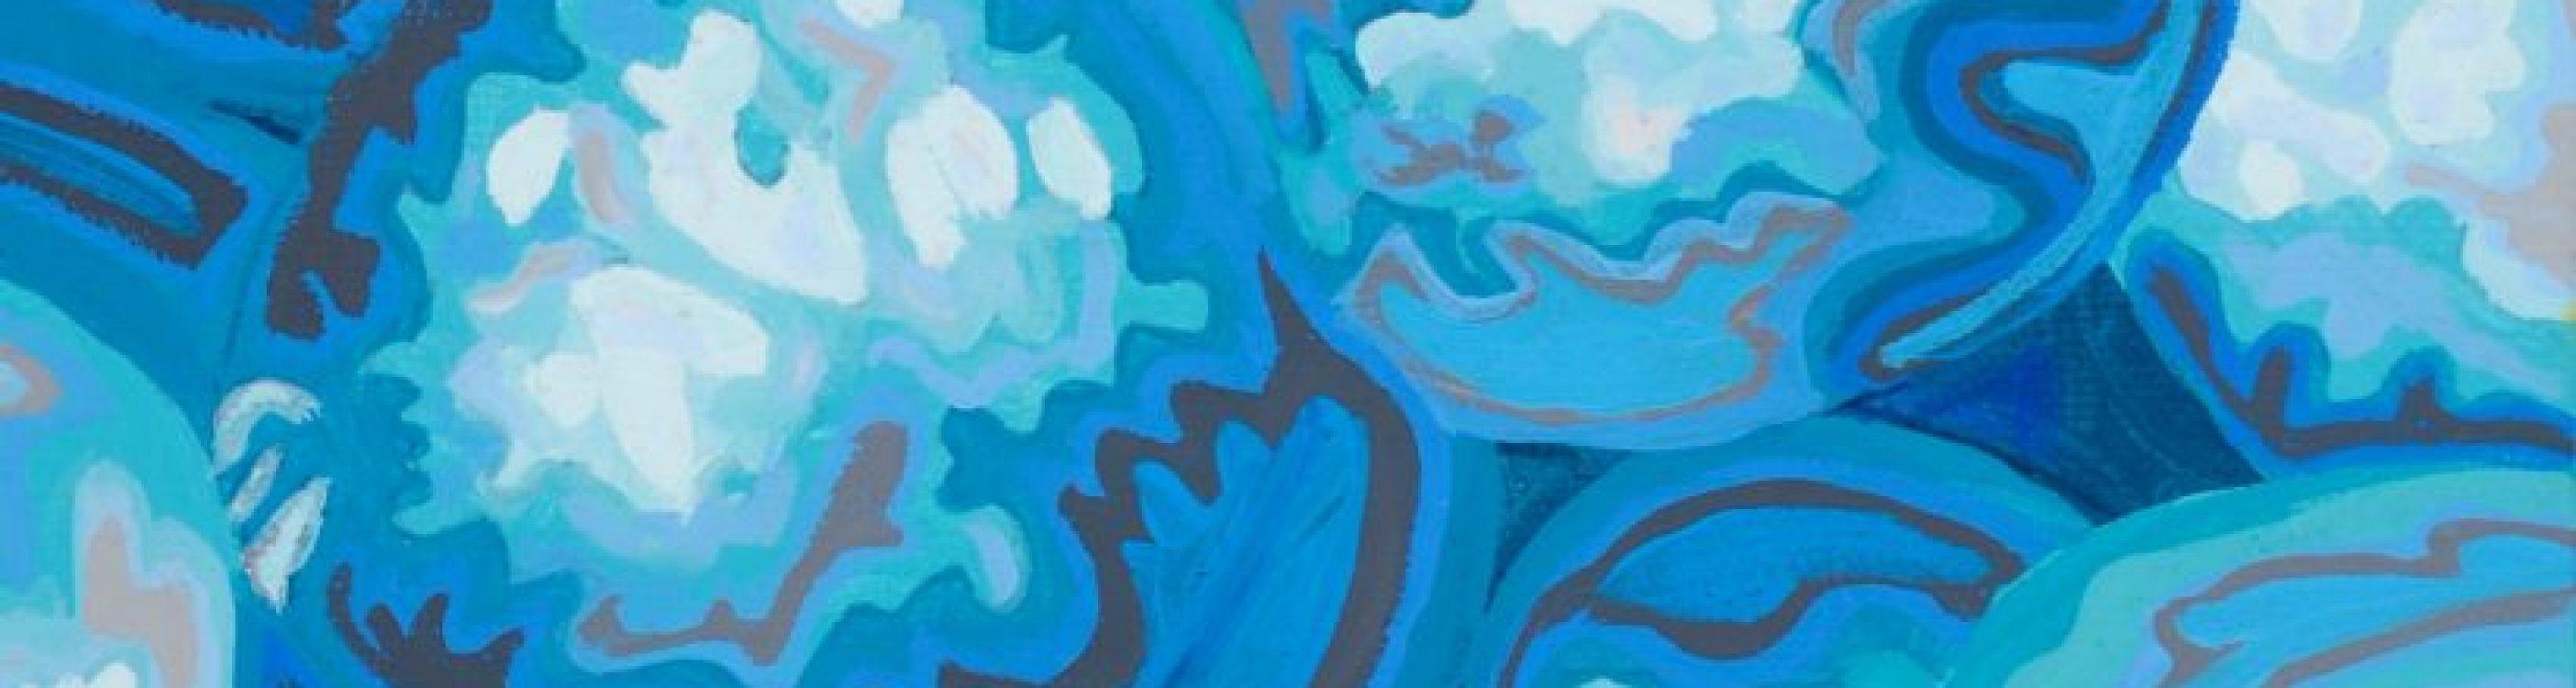 <b>Neebyos</b><br/>Oil on canvas<br/>12x16